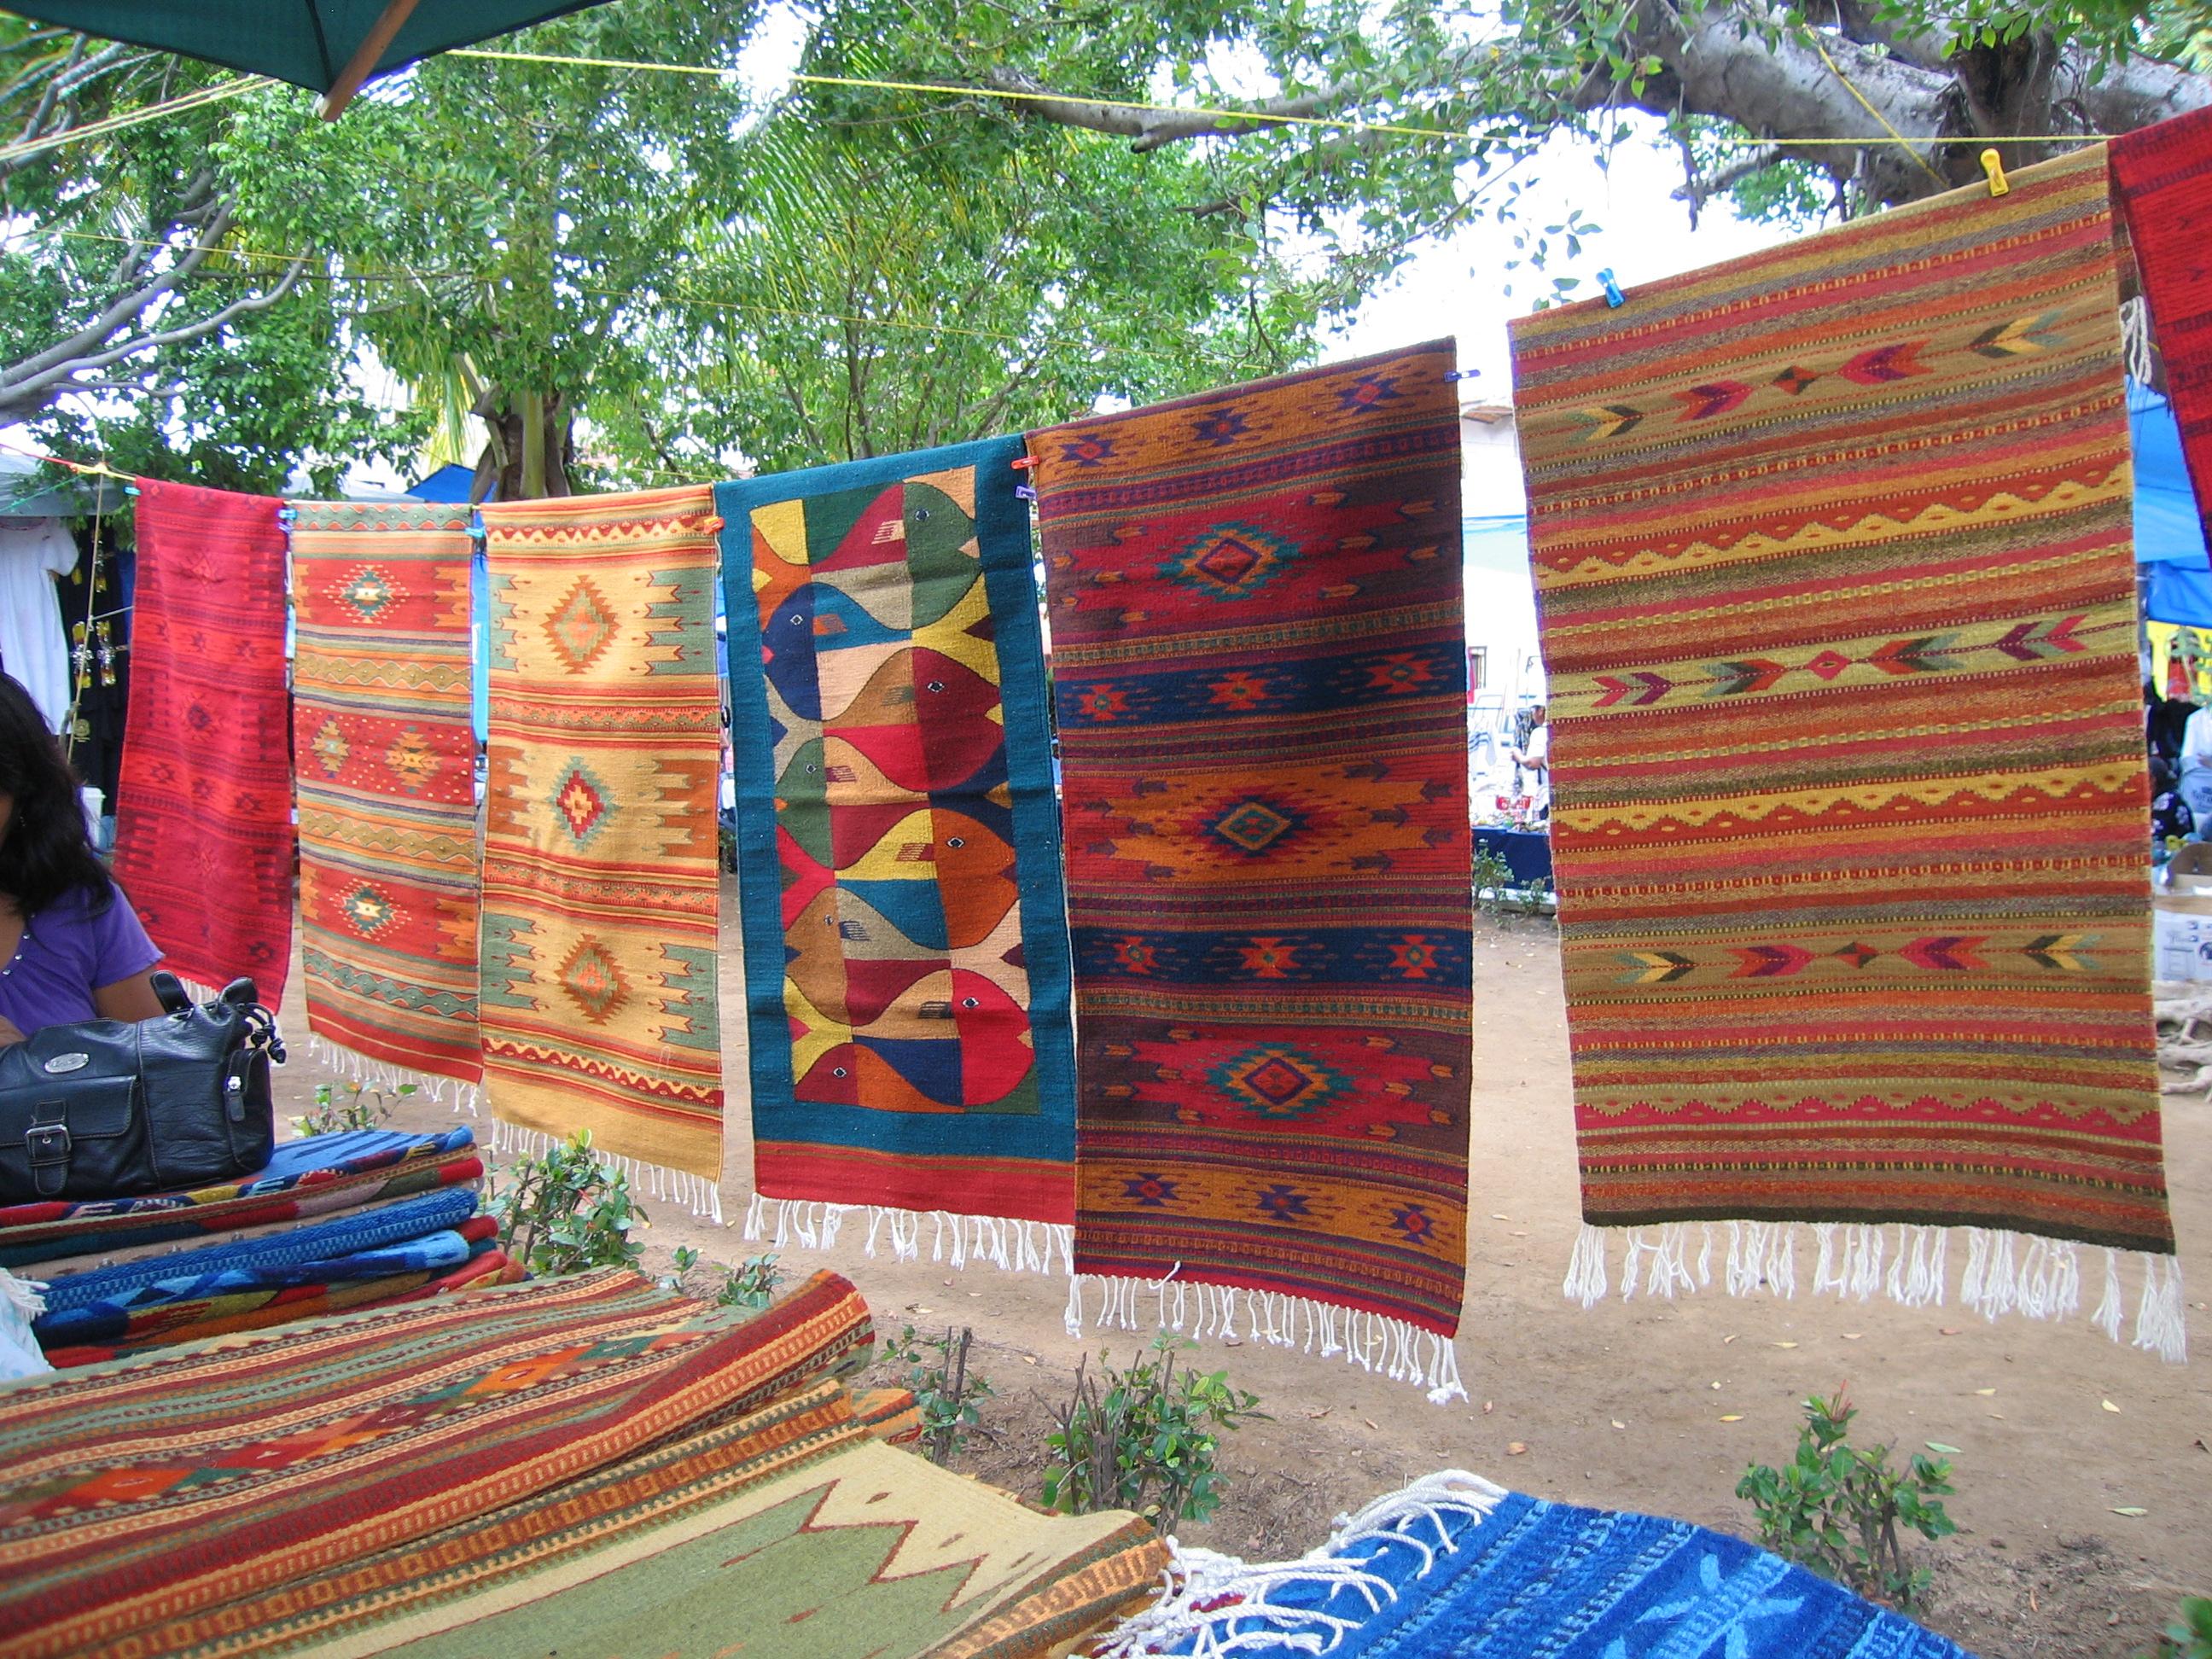 Rug Weaving Study Group Tucson Handweavers And Spinners